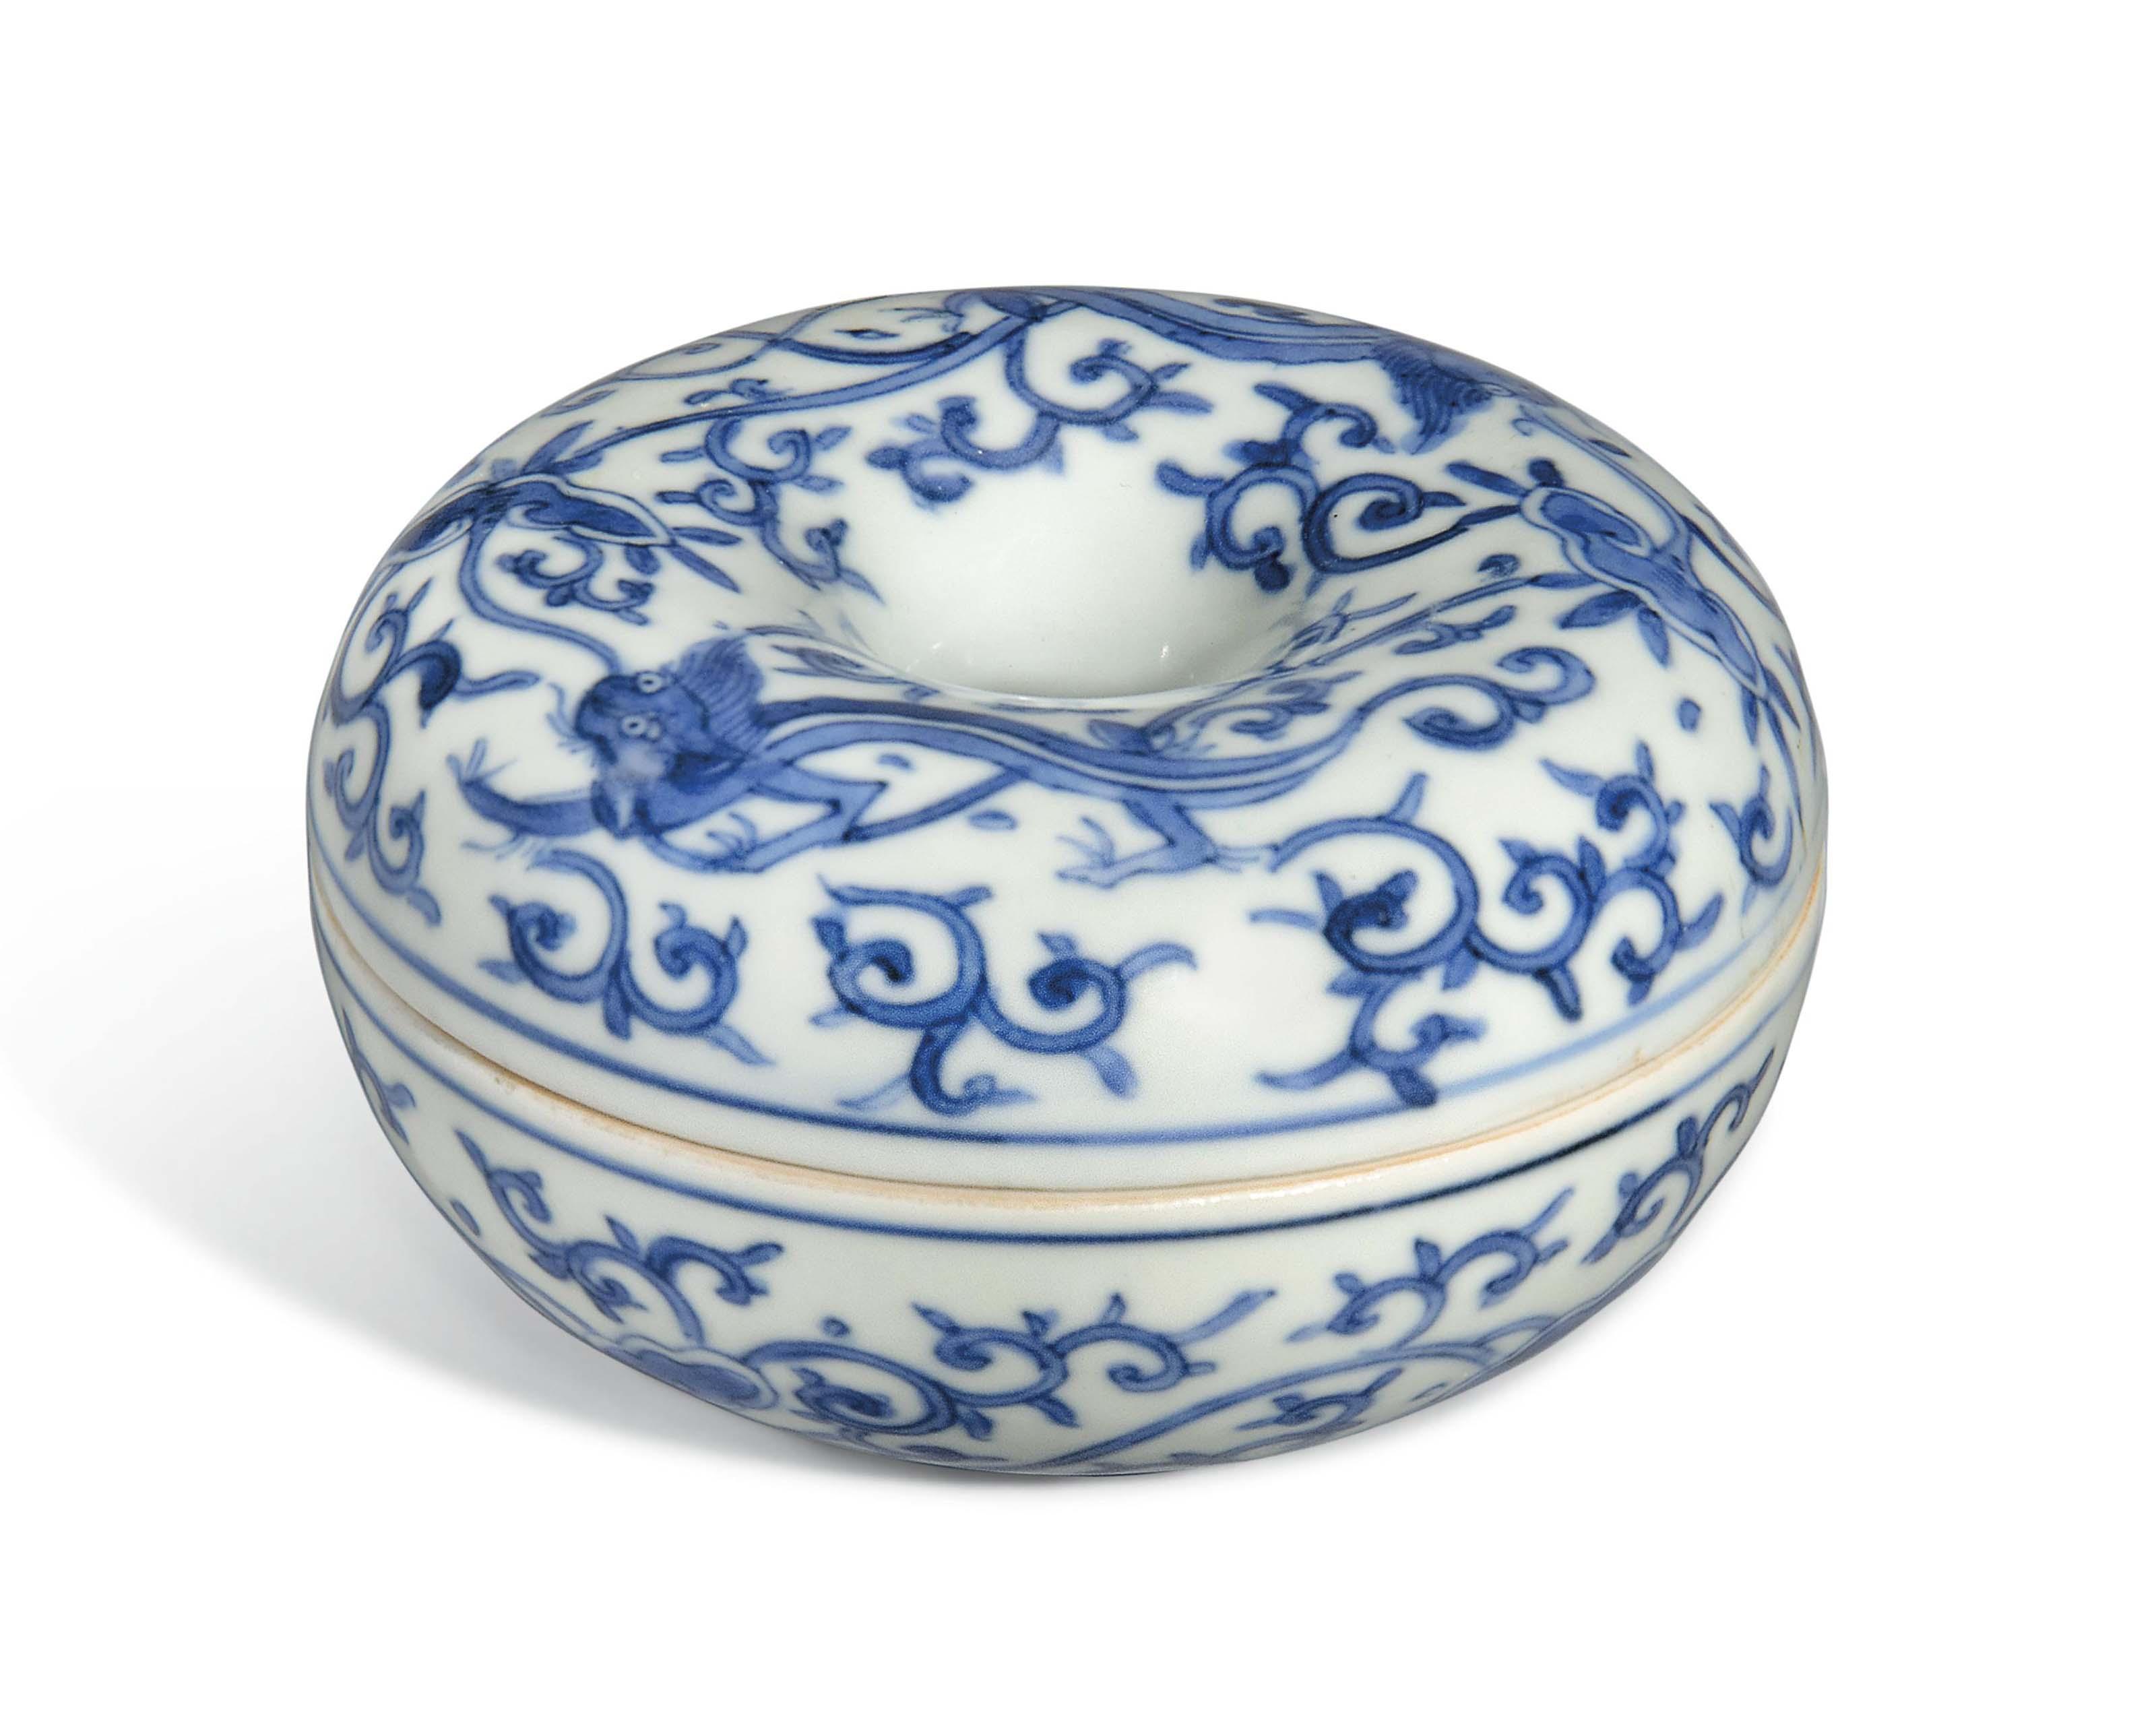 A BLUE AND WHITE CIRCULAR 'DRA